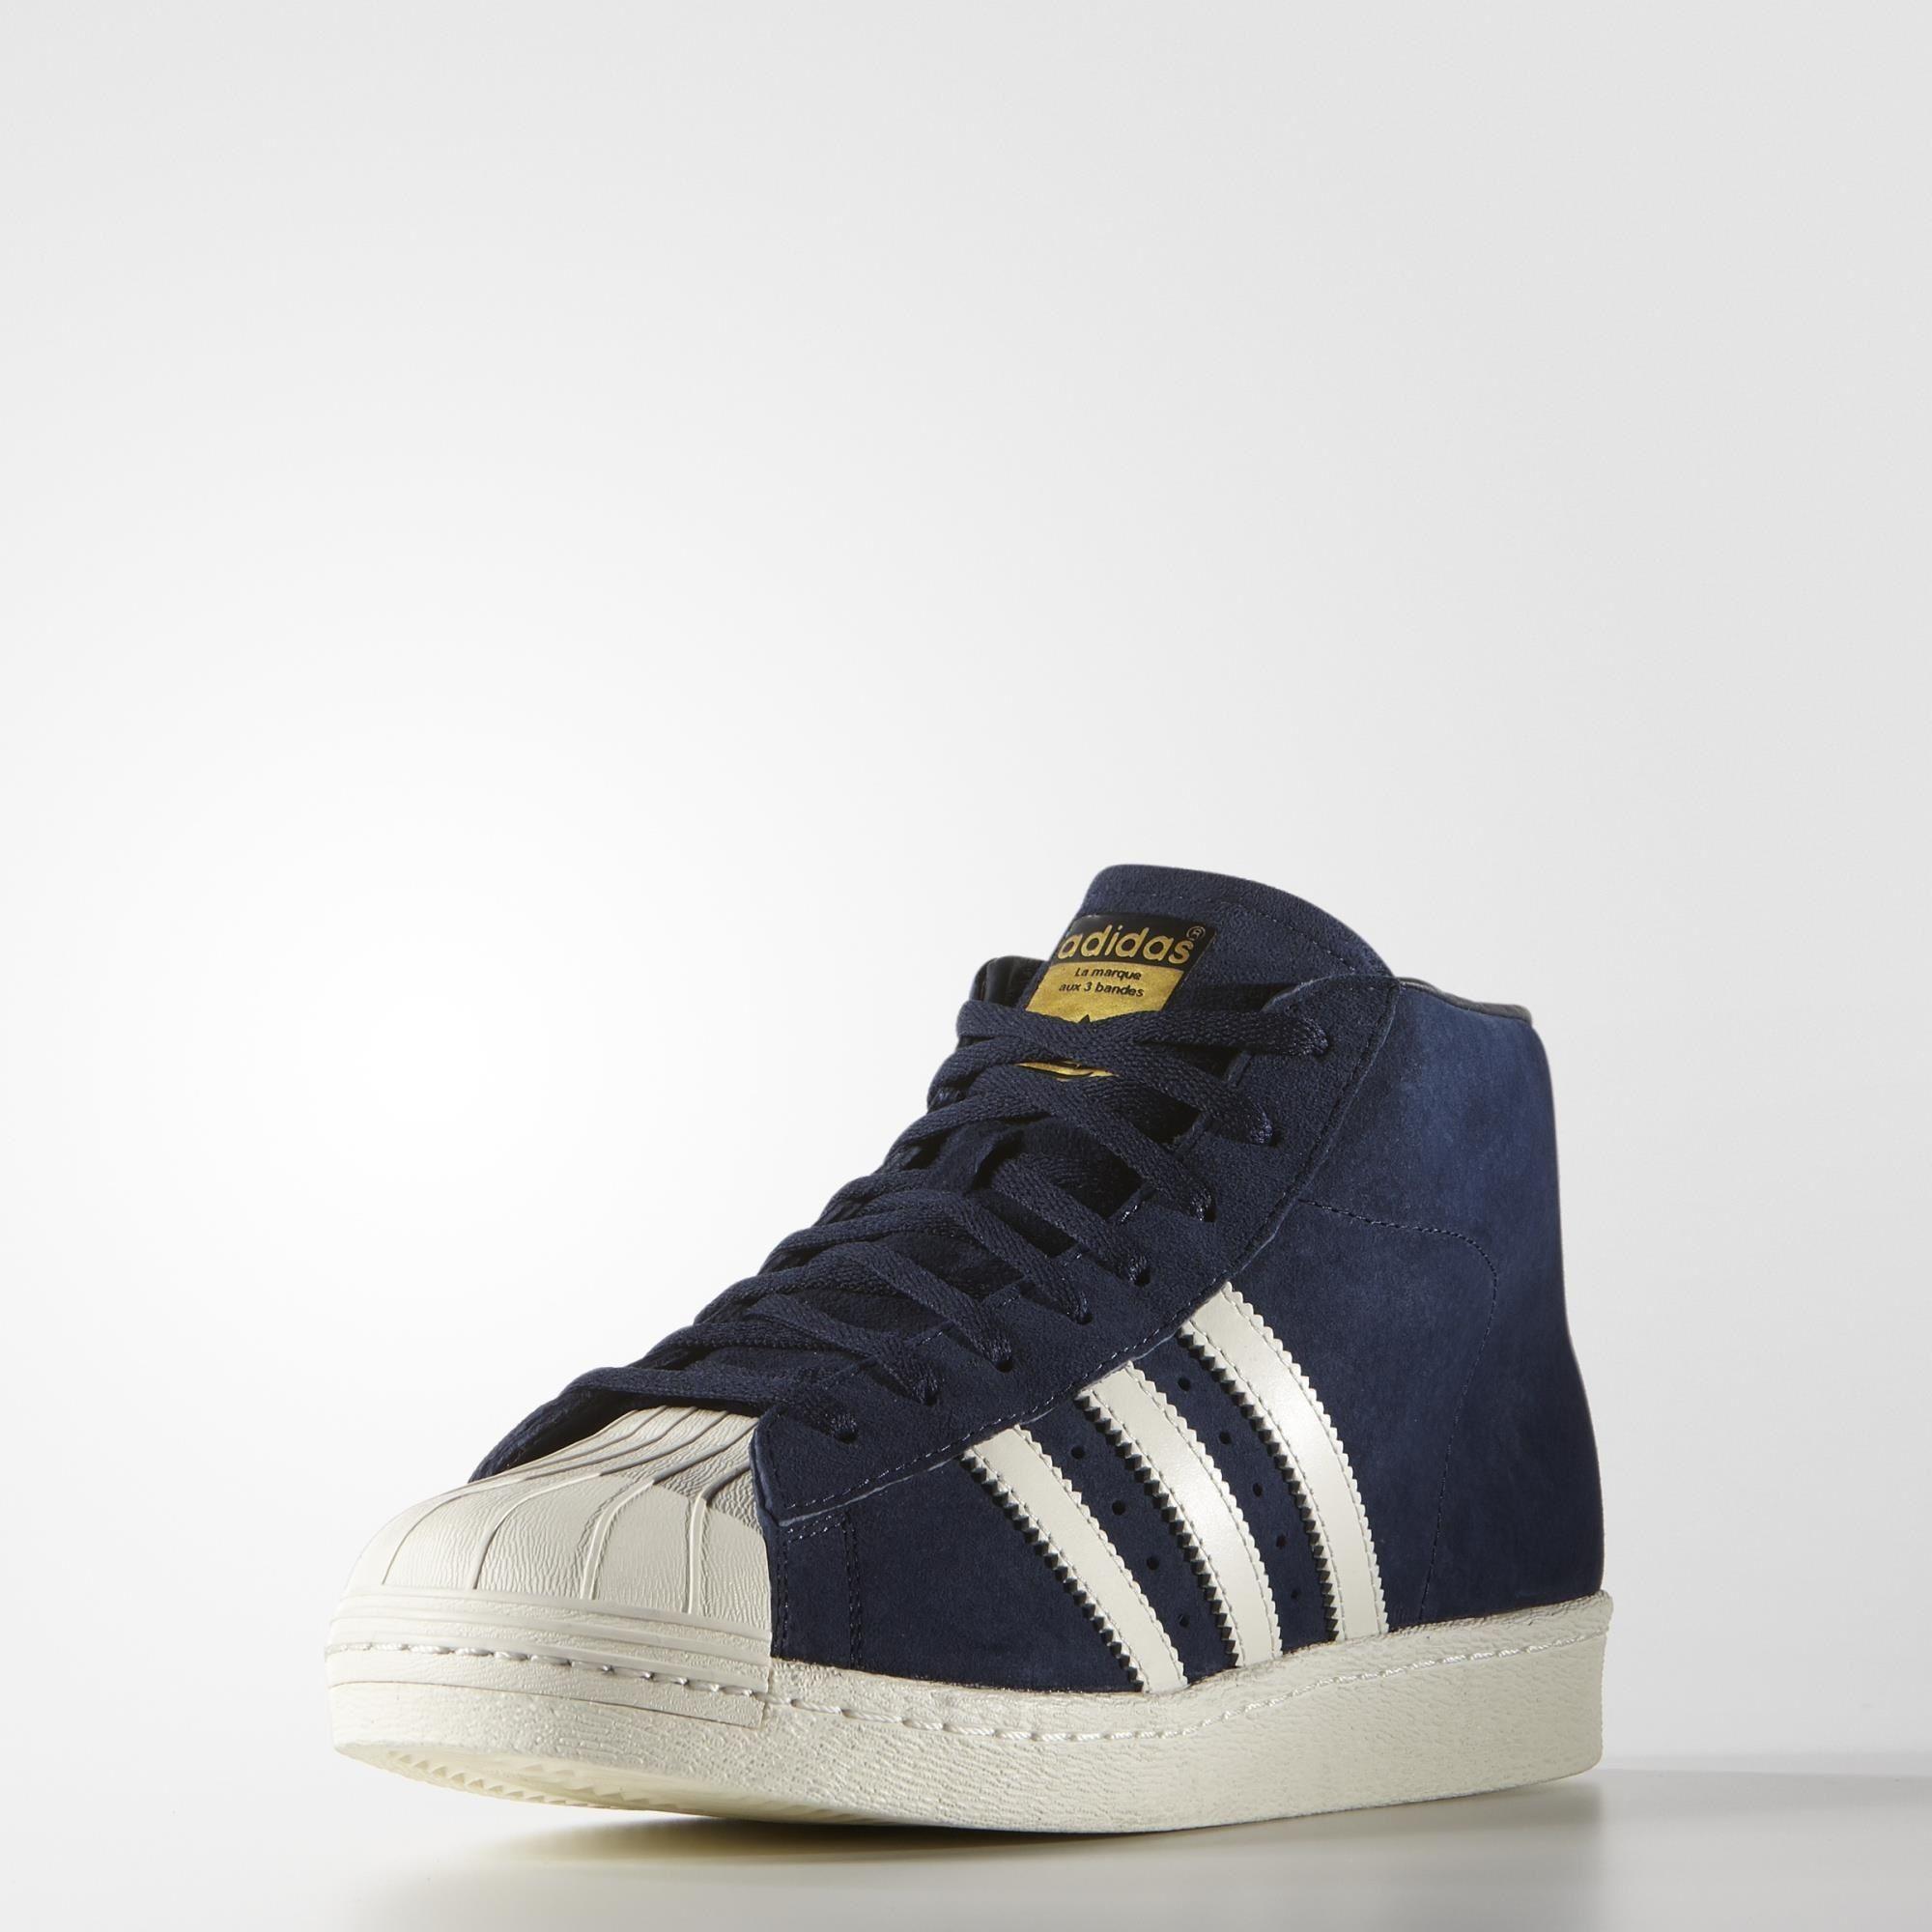 adidas Pro Model Vintage DLX Shoes - Blue | adidas US